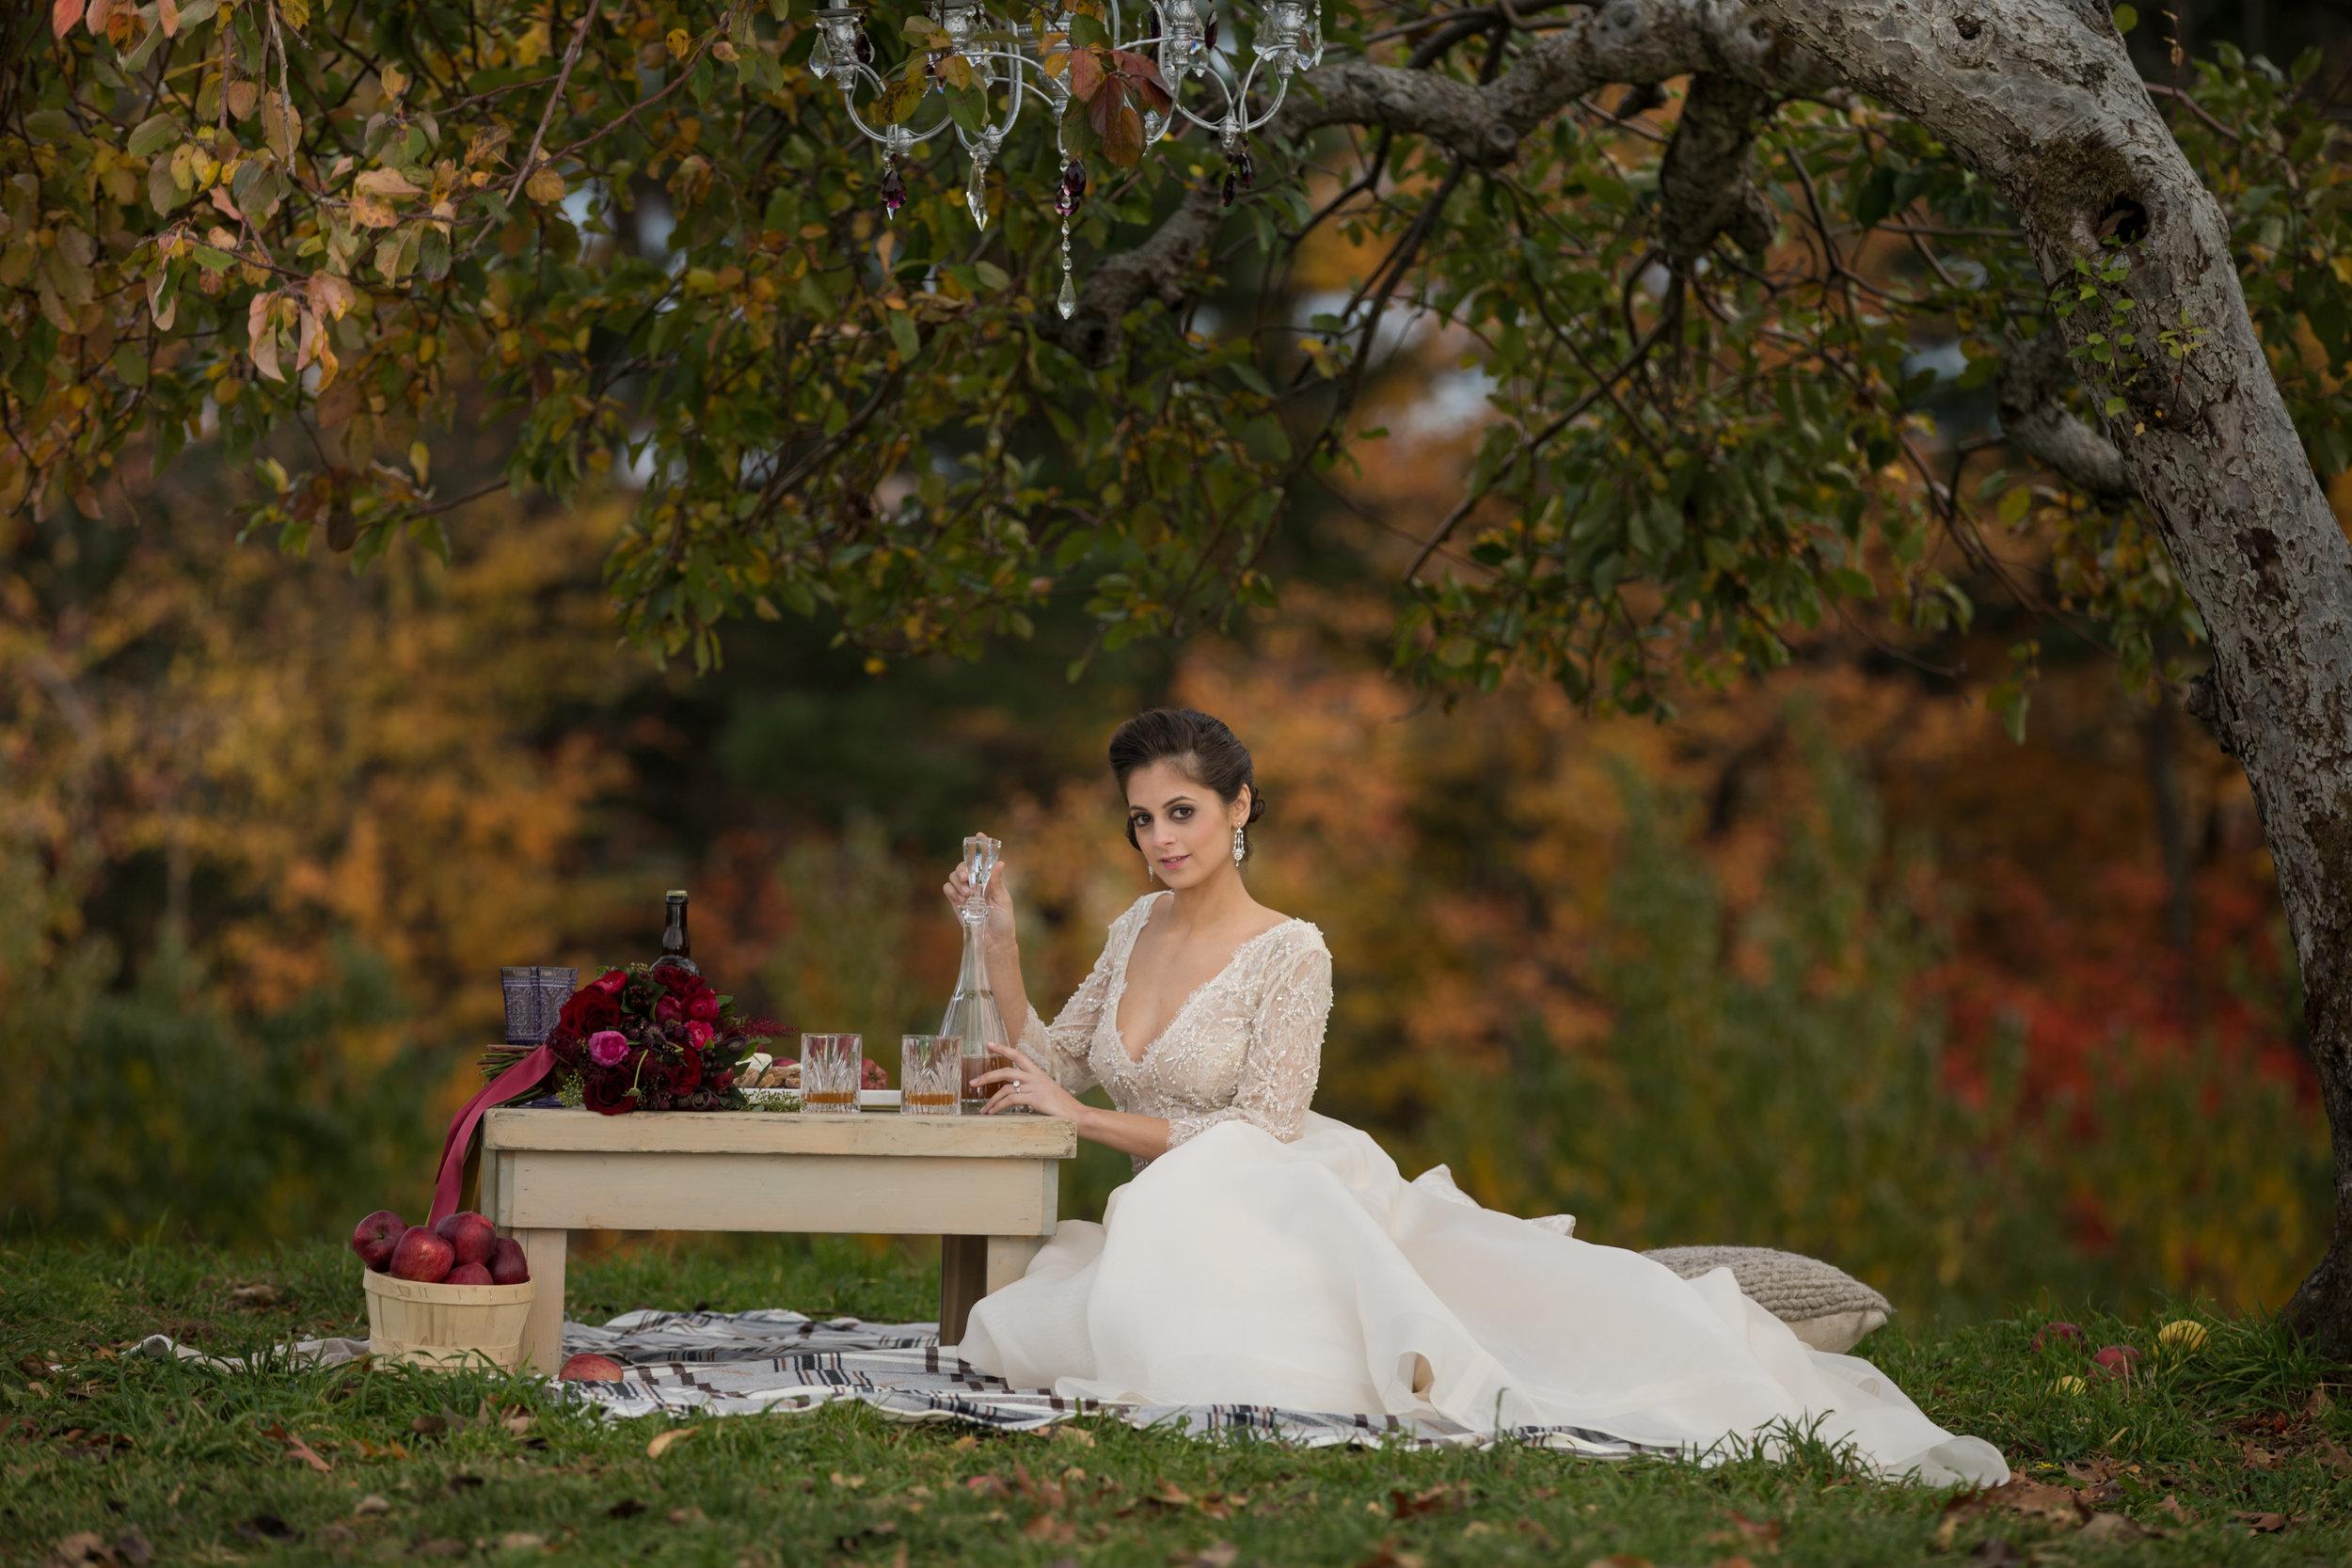 NYC Wedding Planner Ashley Douglass Events at Harvest Moon Farm Orchard